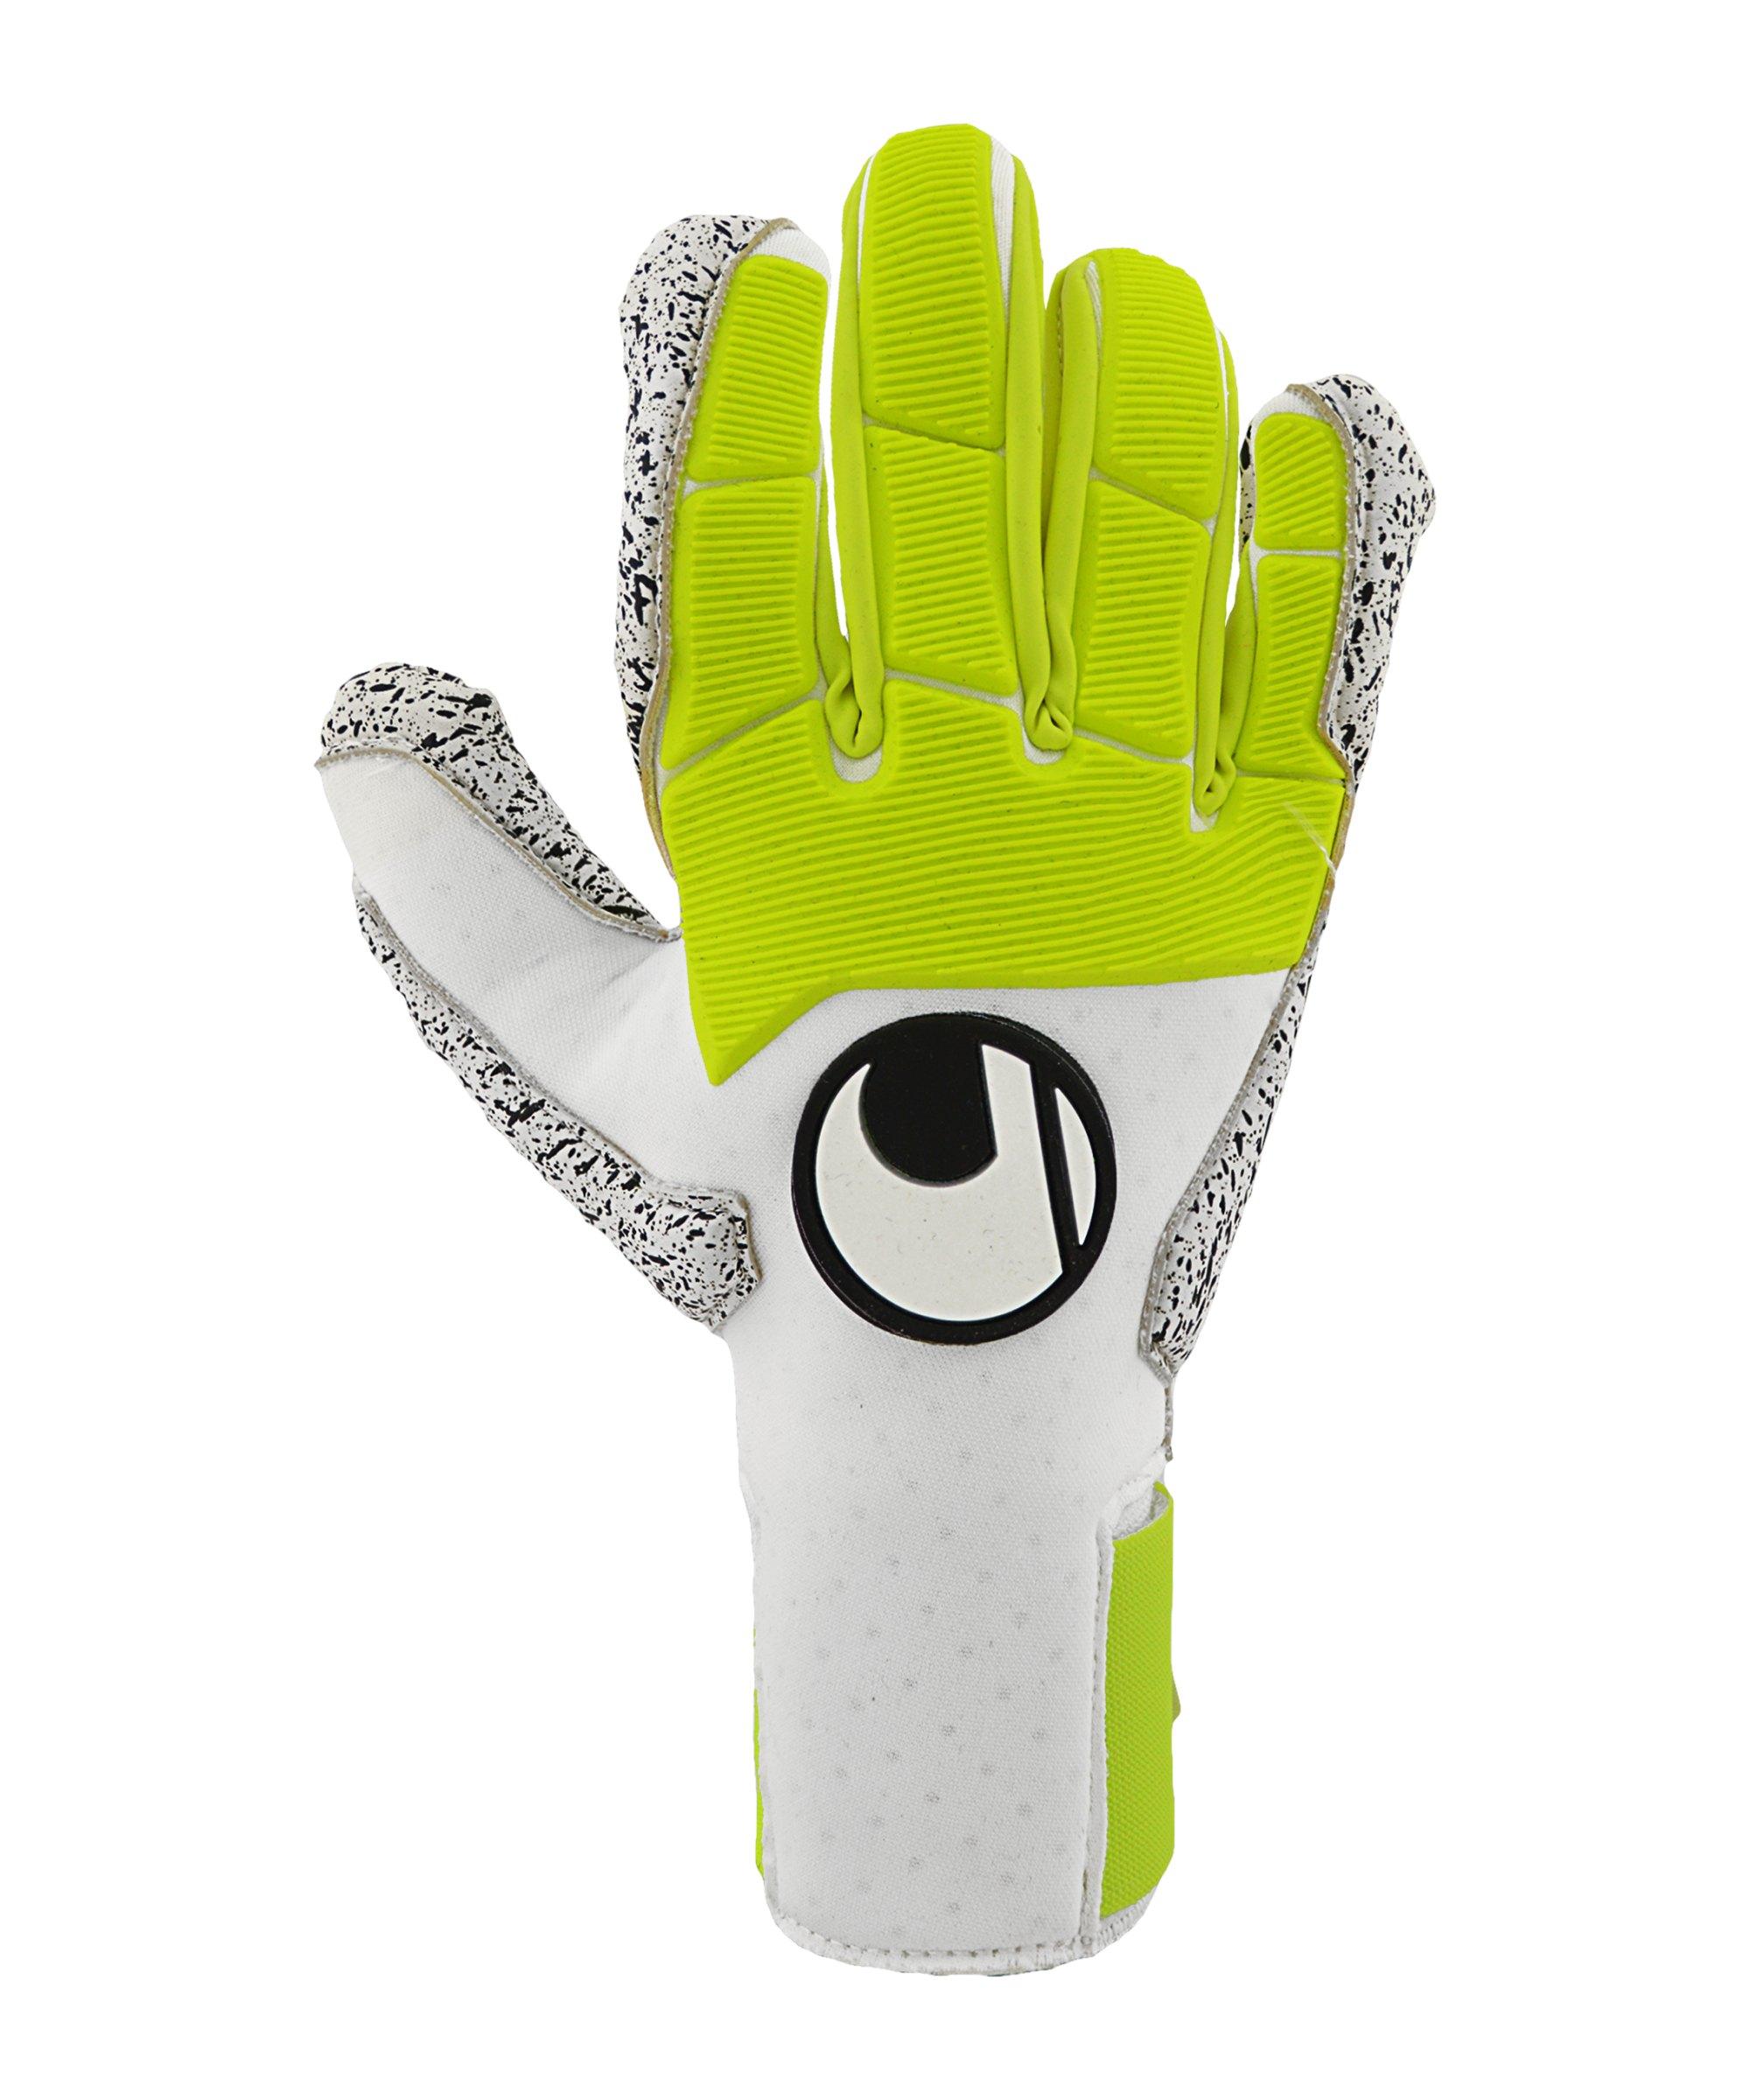 Uhlsport Pure Alliance Supergrip+ TW-Handschuh F01 - weiss